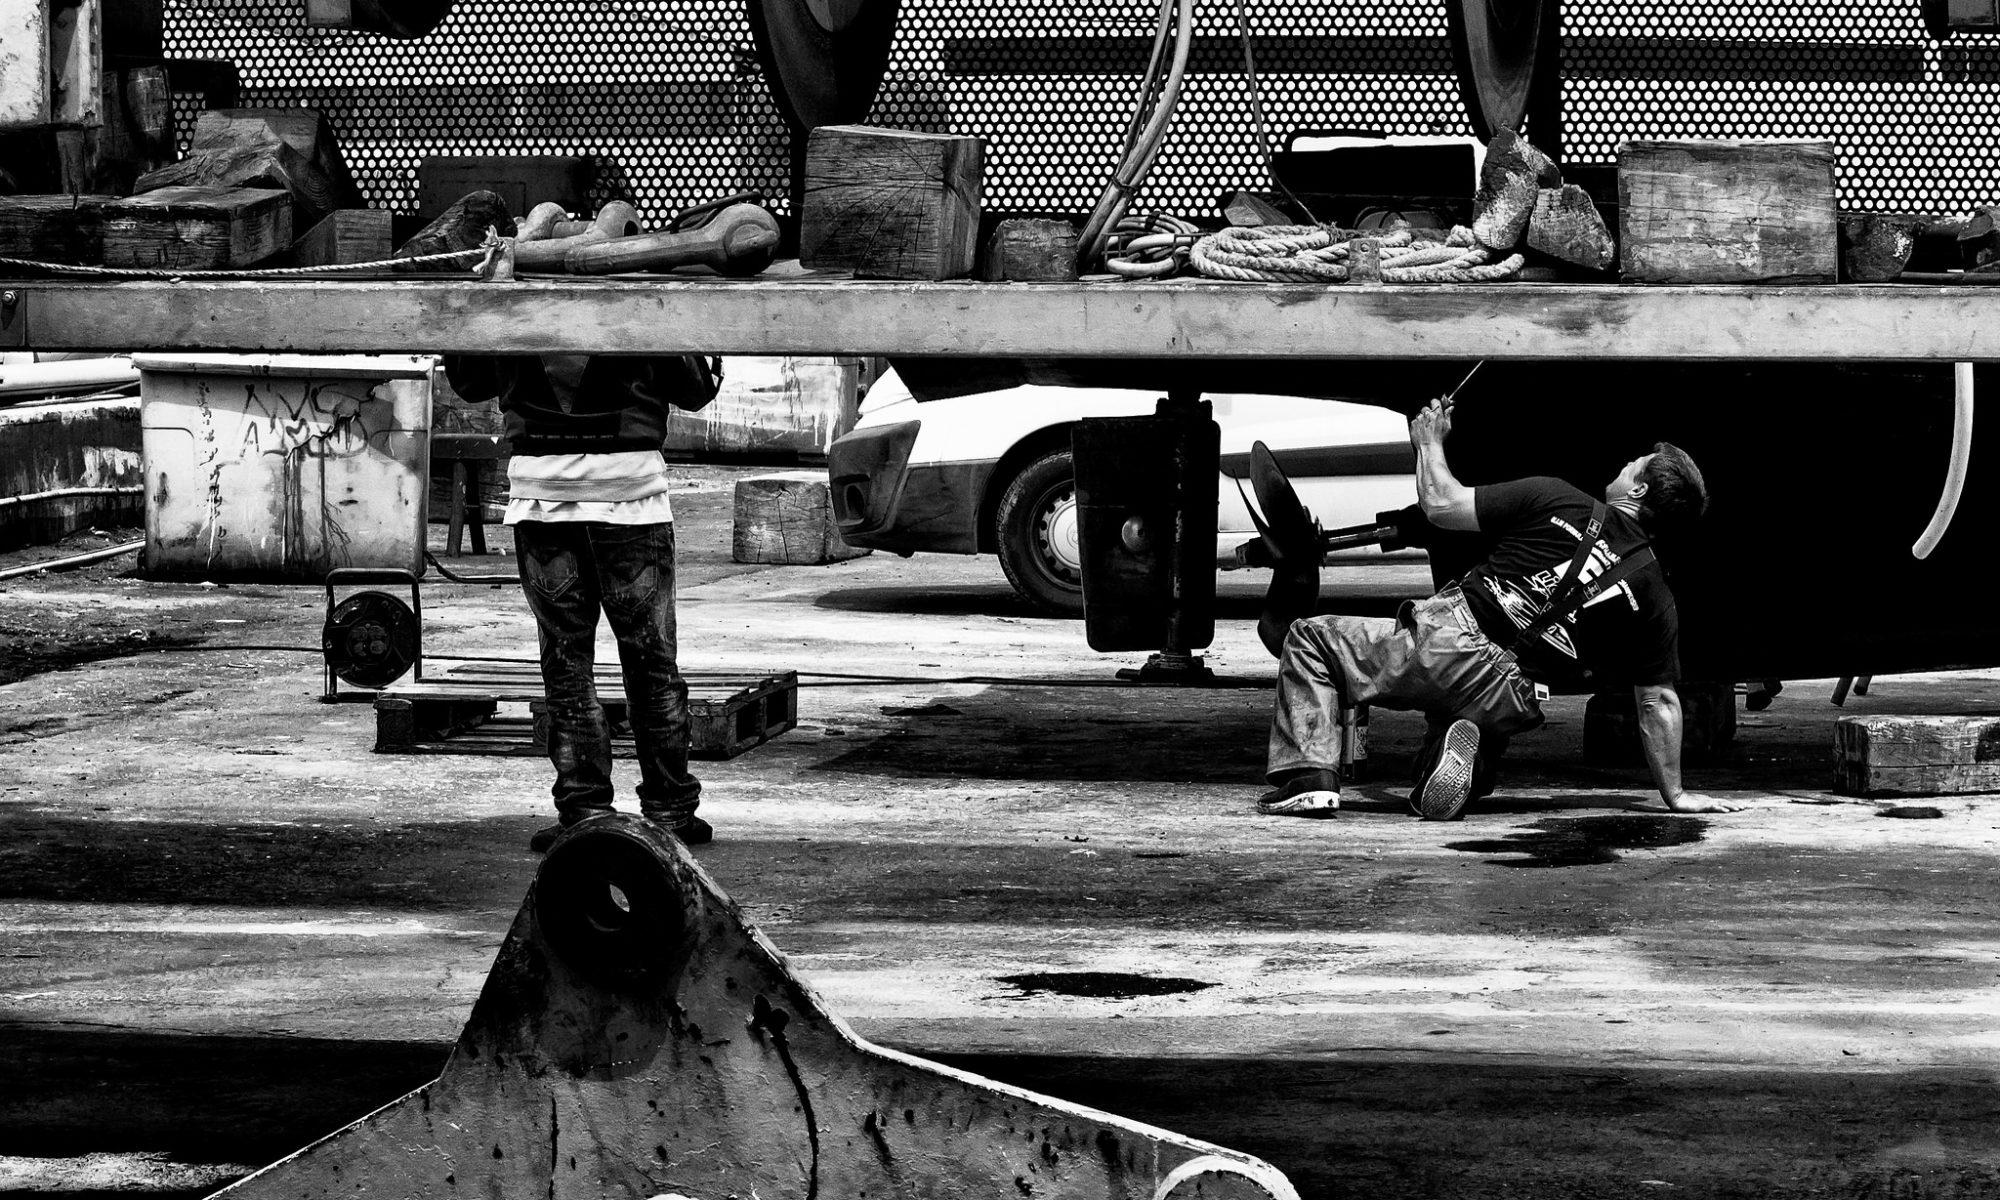 Fabrice Denis - BreakDance !!! Port de la Cotinière - Chantier naval - en cc sur Flickr - https://www.flickr.com/photos/fabricedenisphotography/28377198296/